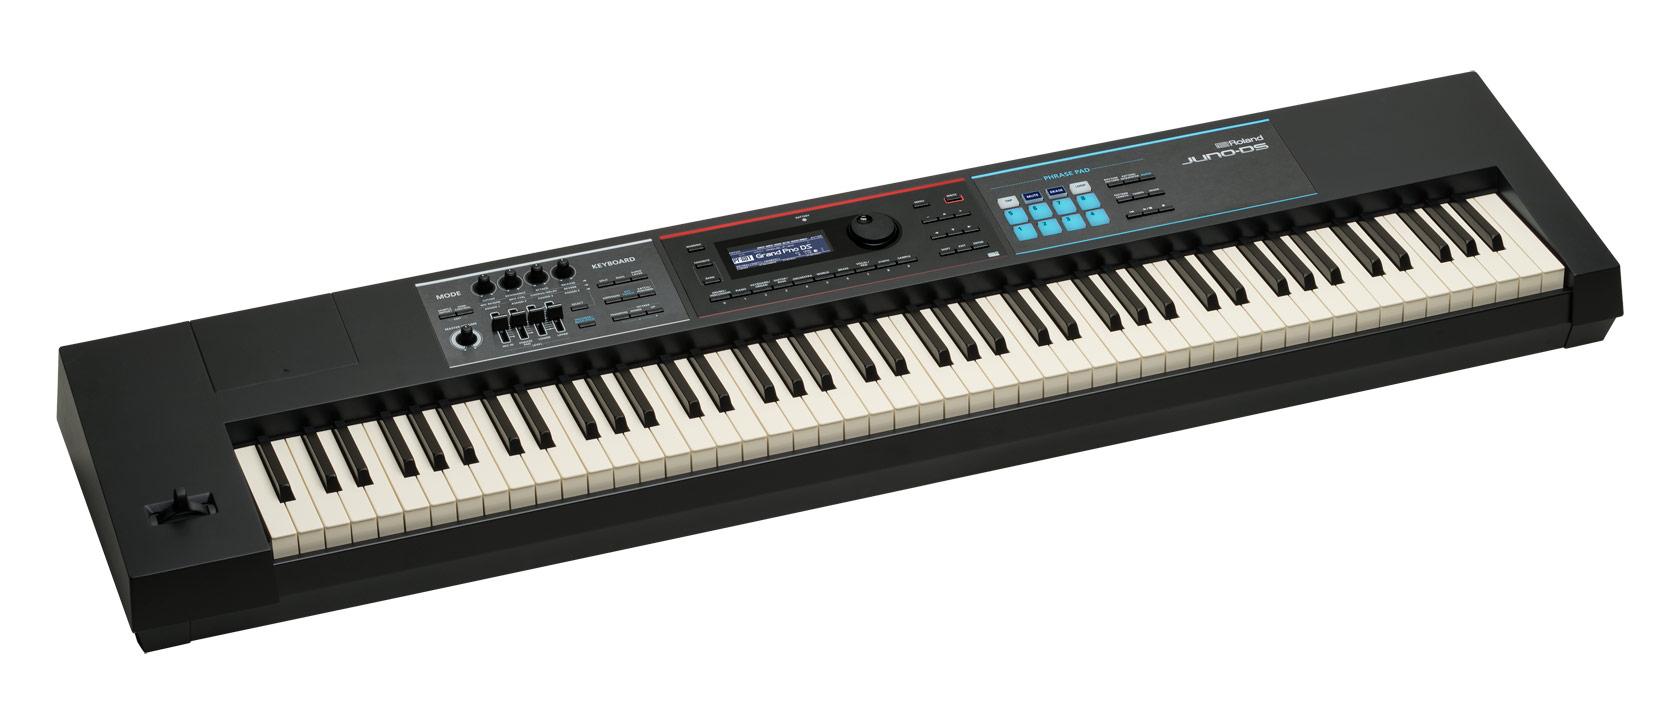 Roland Juno DS88 main